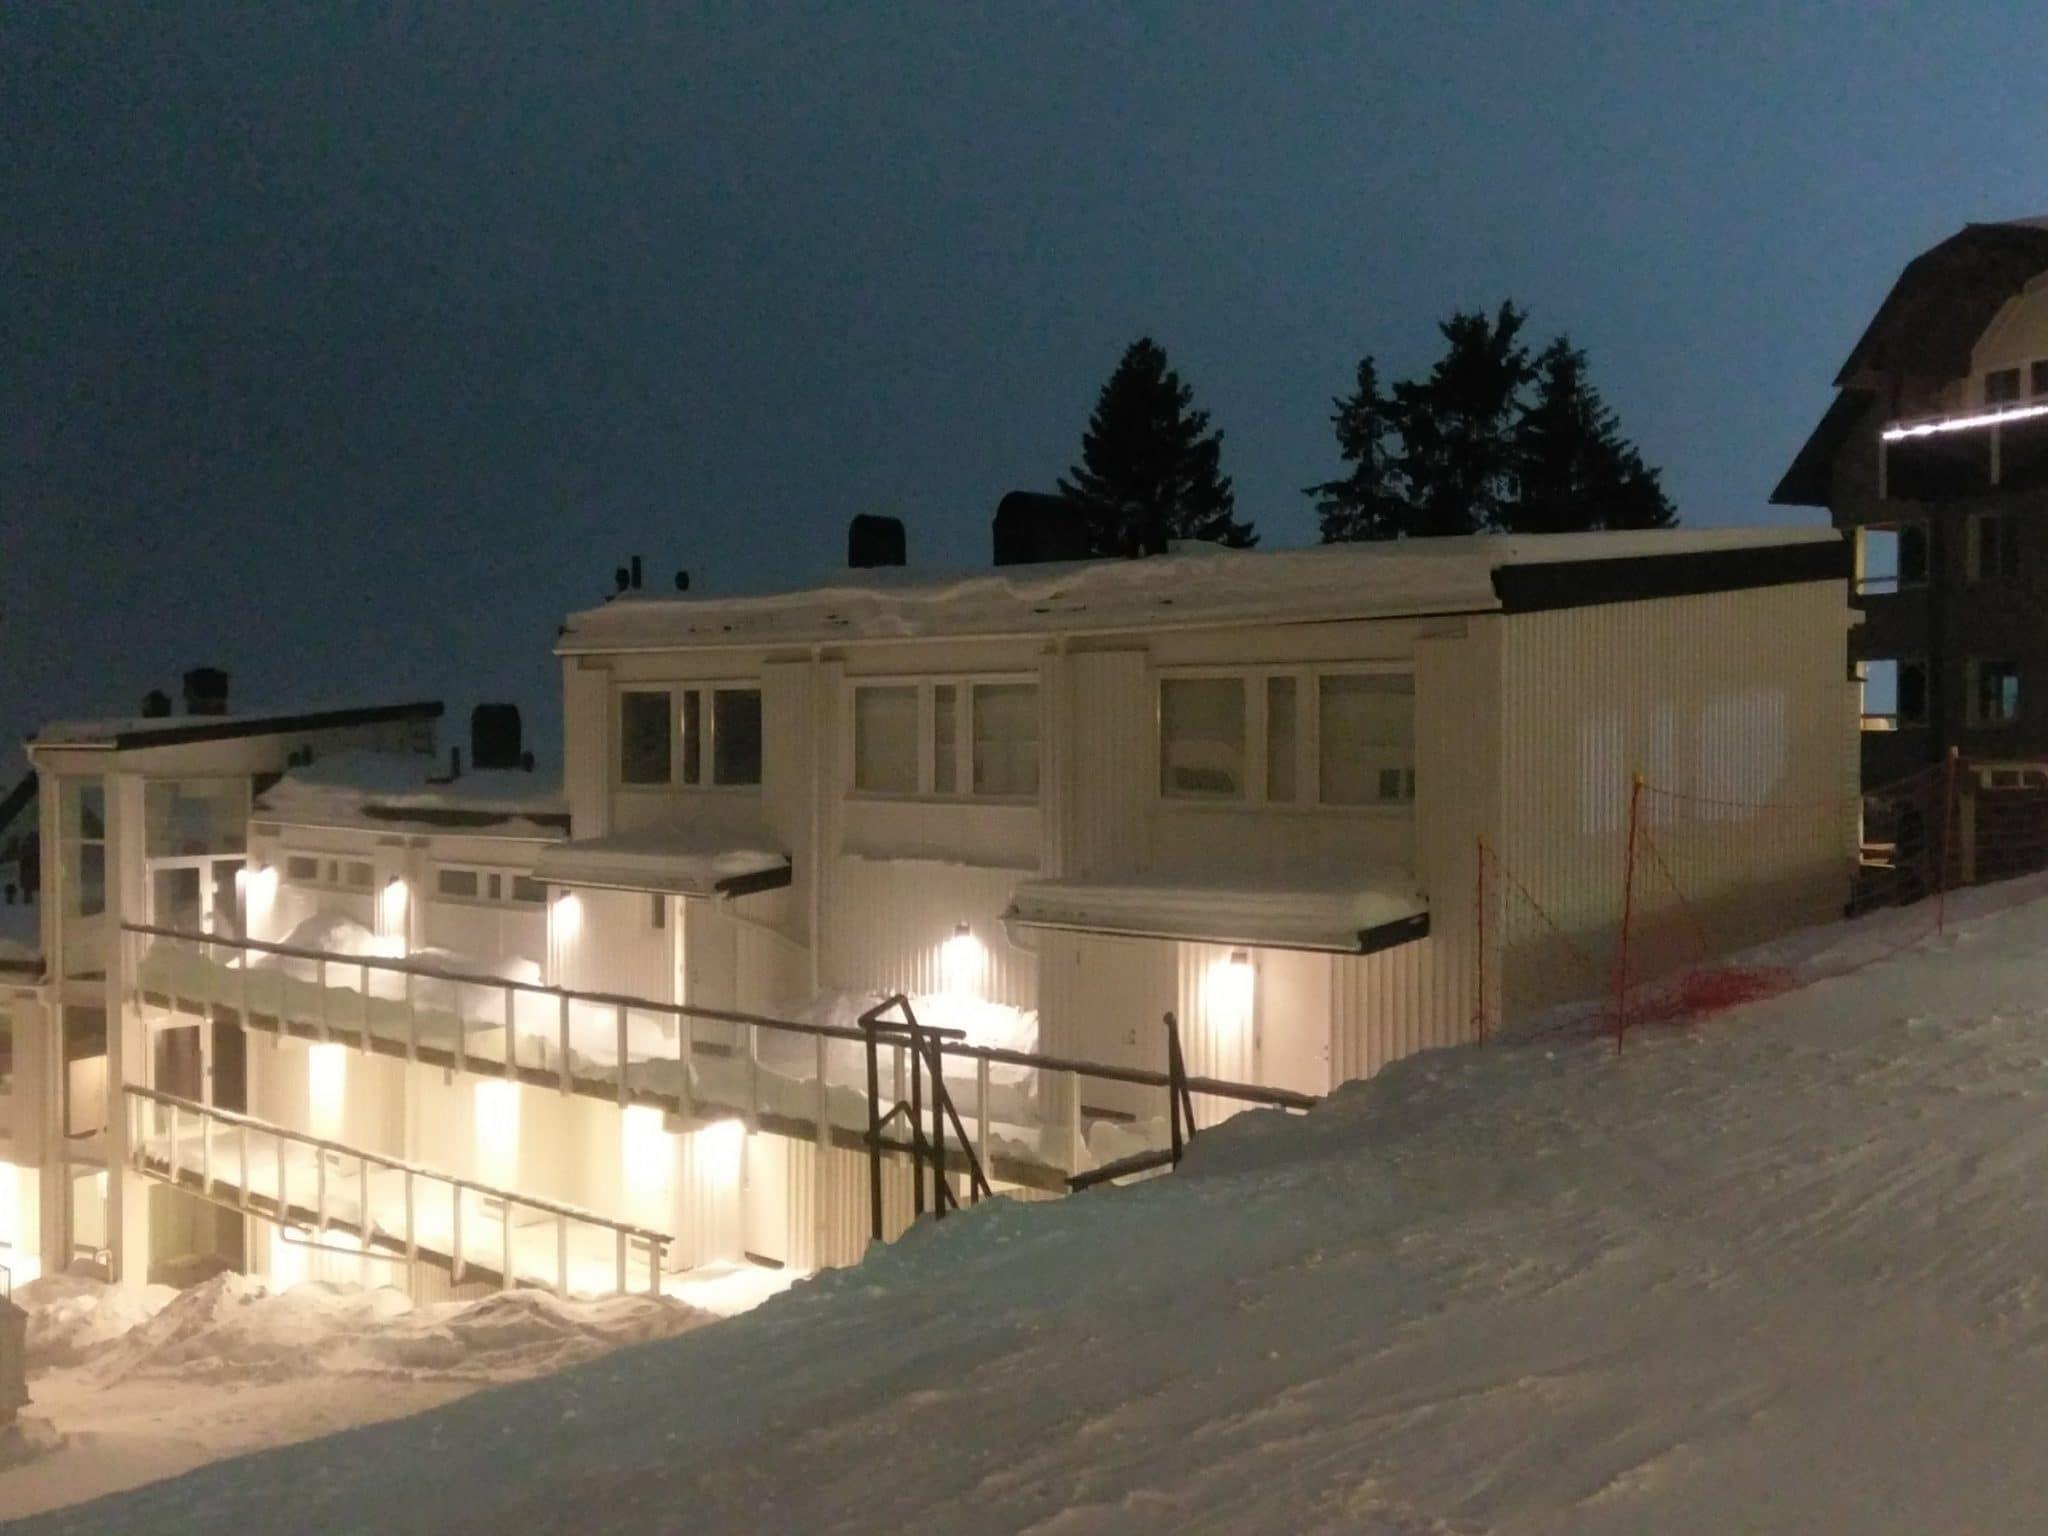 Sporthotellet 2 in Åre in winter